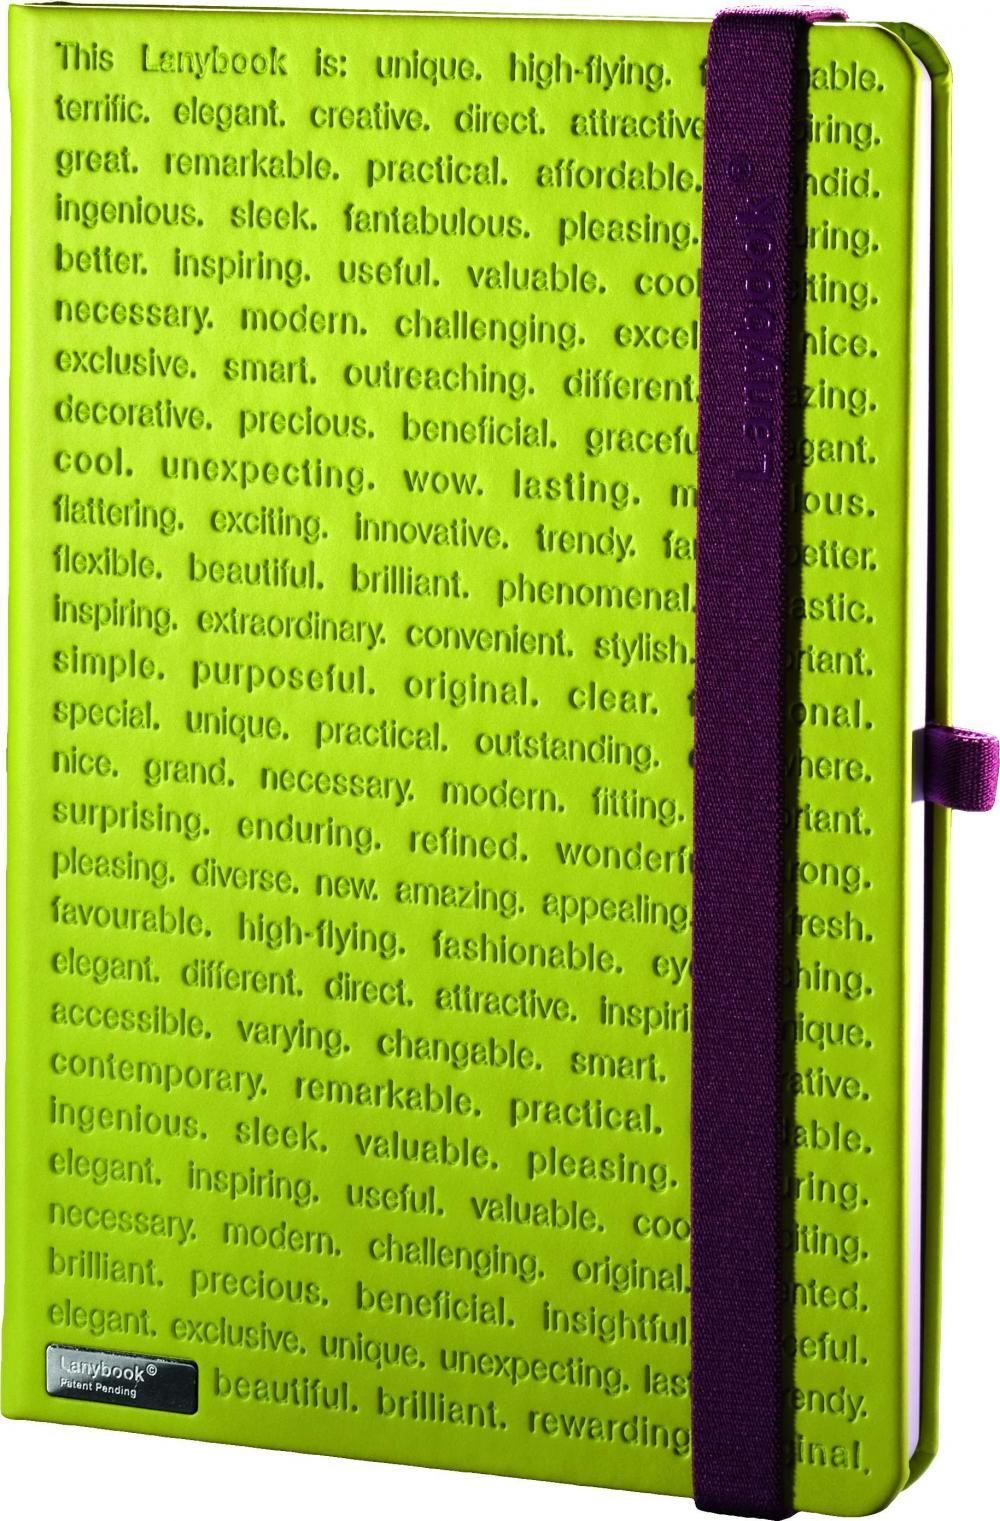 Agenda 17x25,The One 3,verde,velin